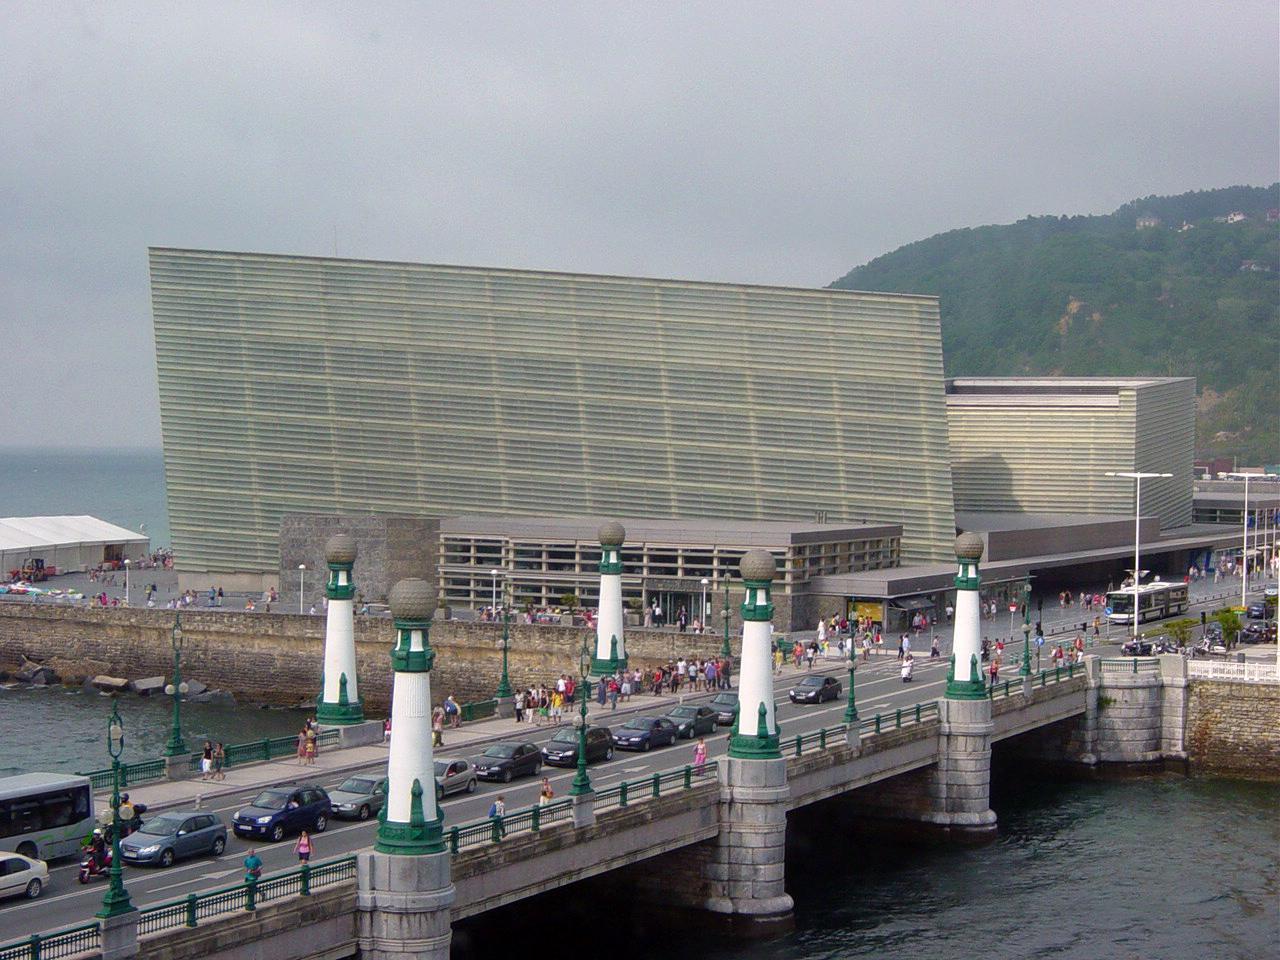 kursaal congress photo by generalpoteito Wikimedia Commons